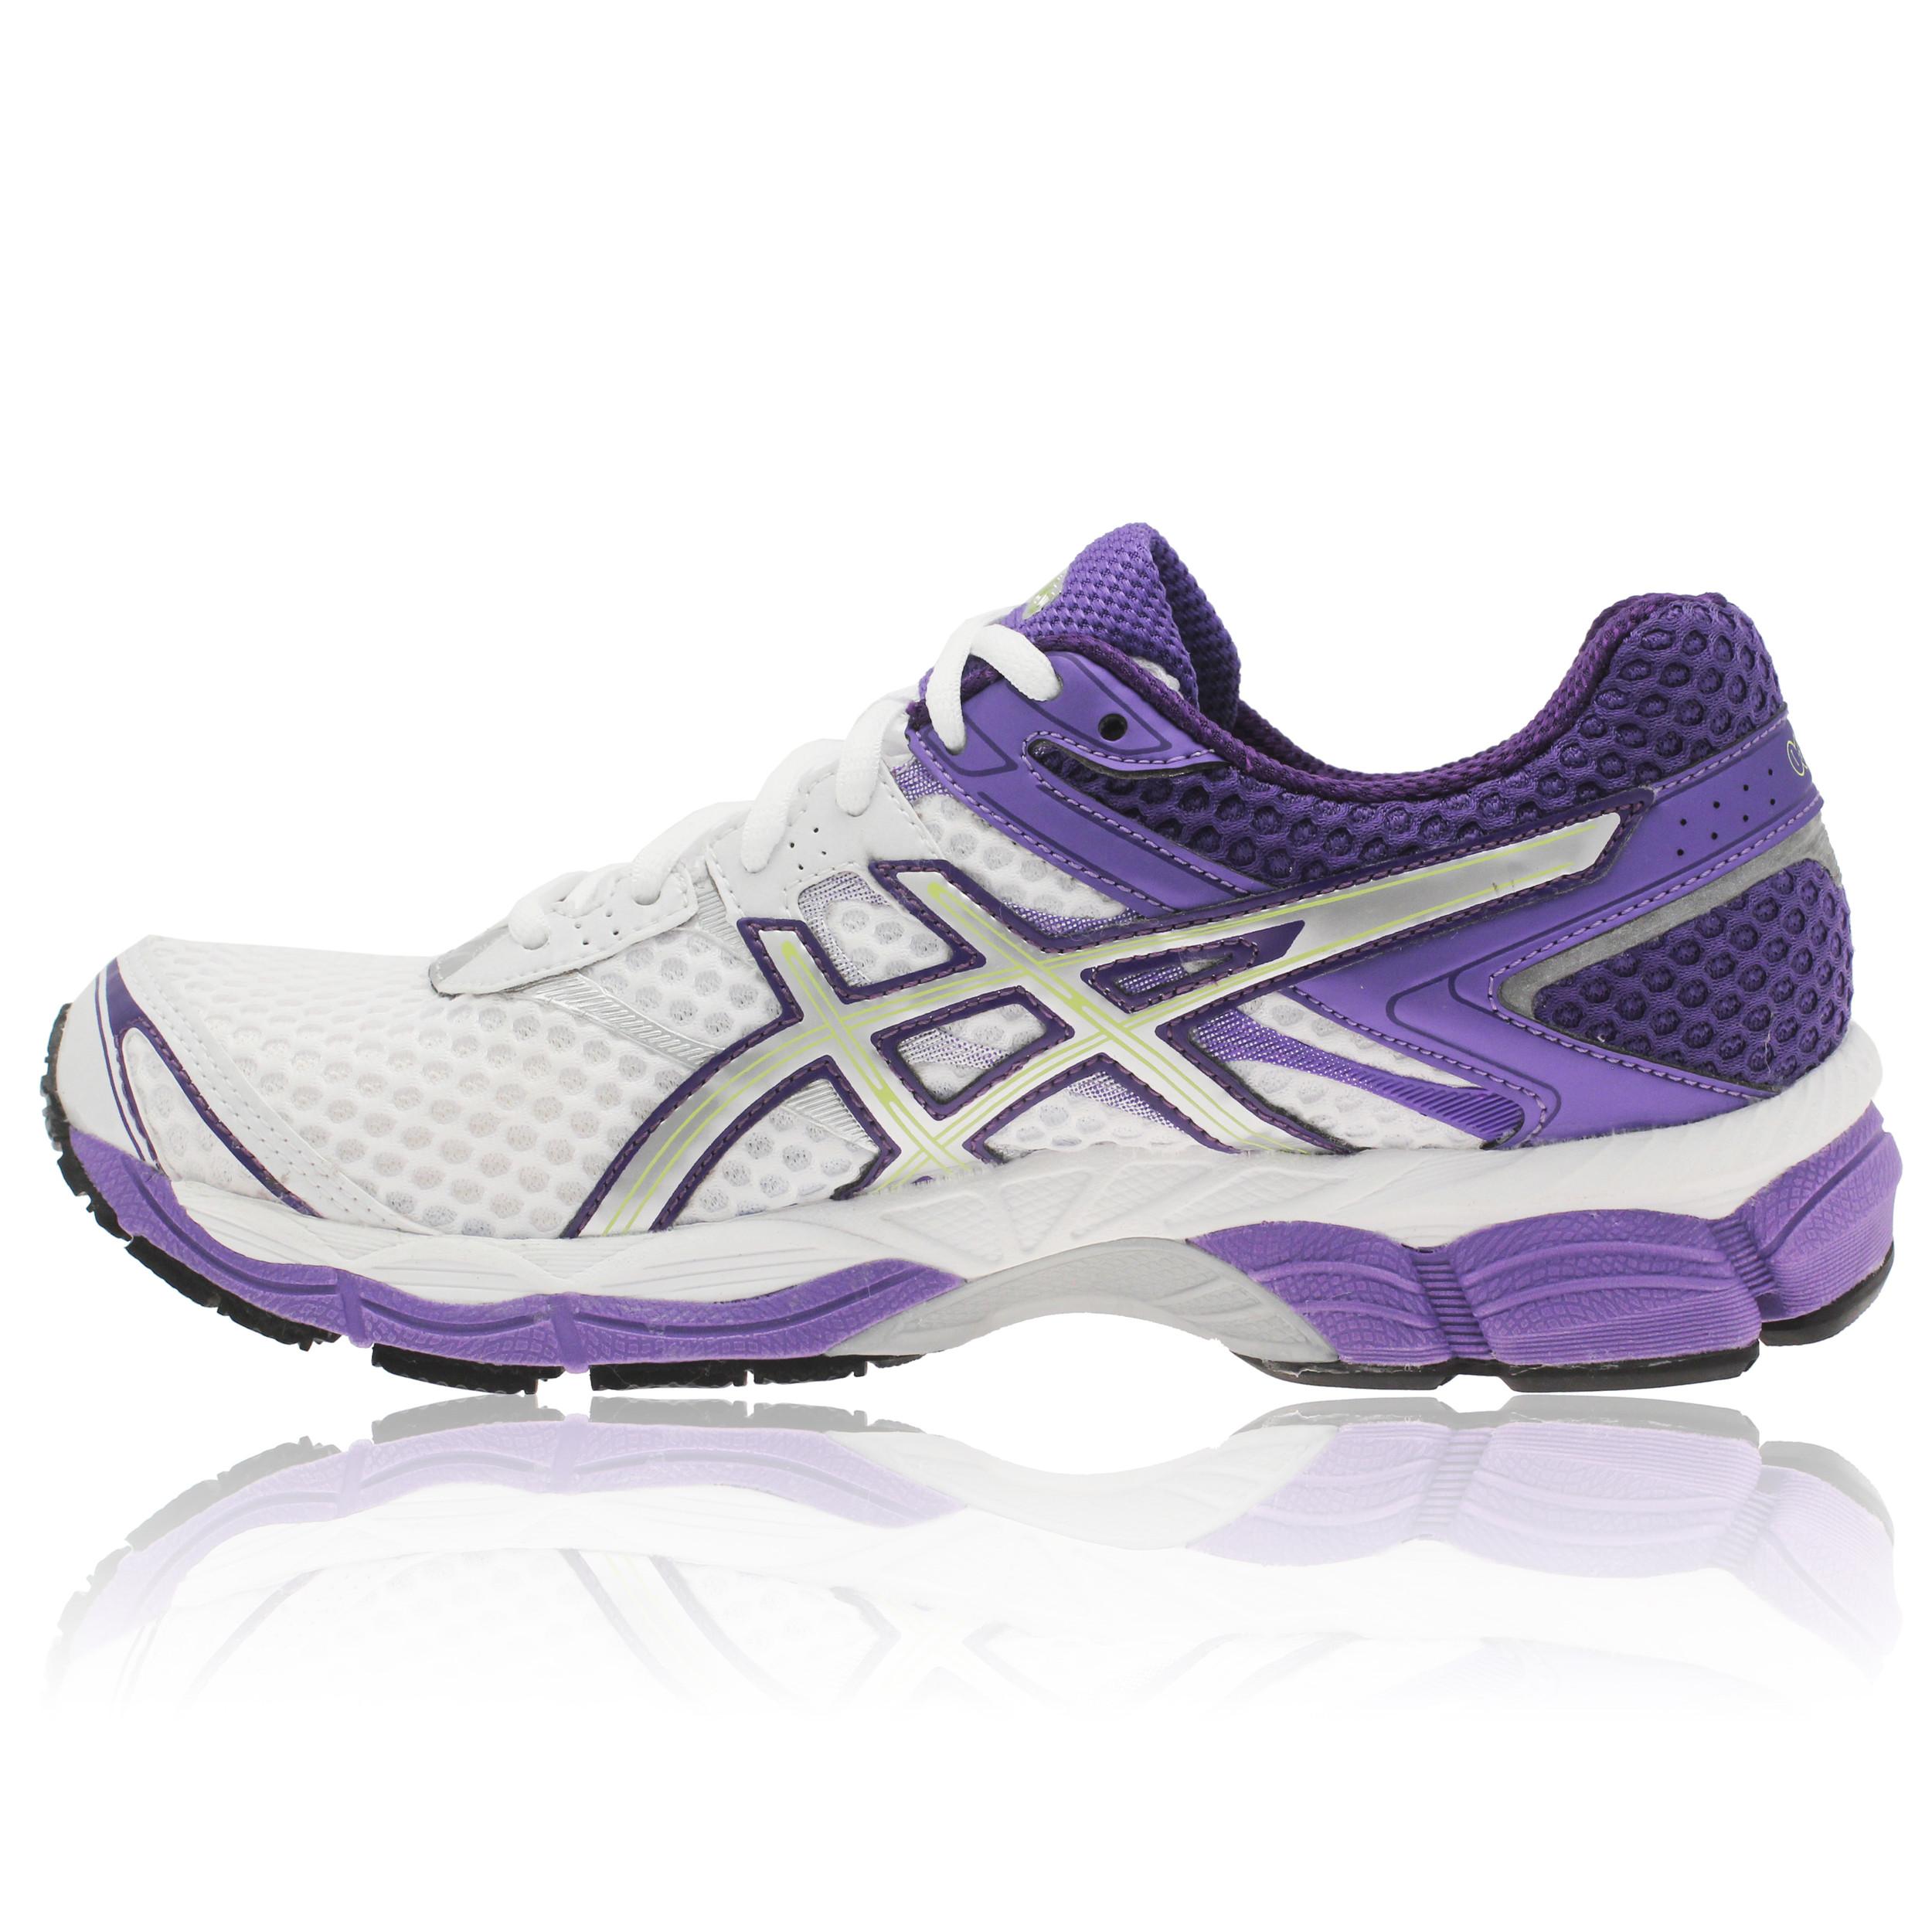 asics gel cumulus 16 women 39 s running shoes 50 off. Black Bedroom Furniture Sets. Home Design Ideas